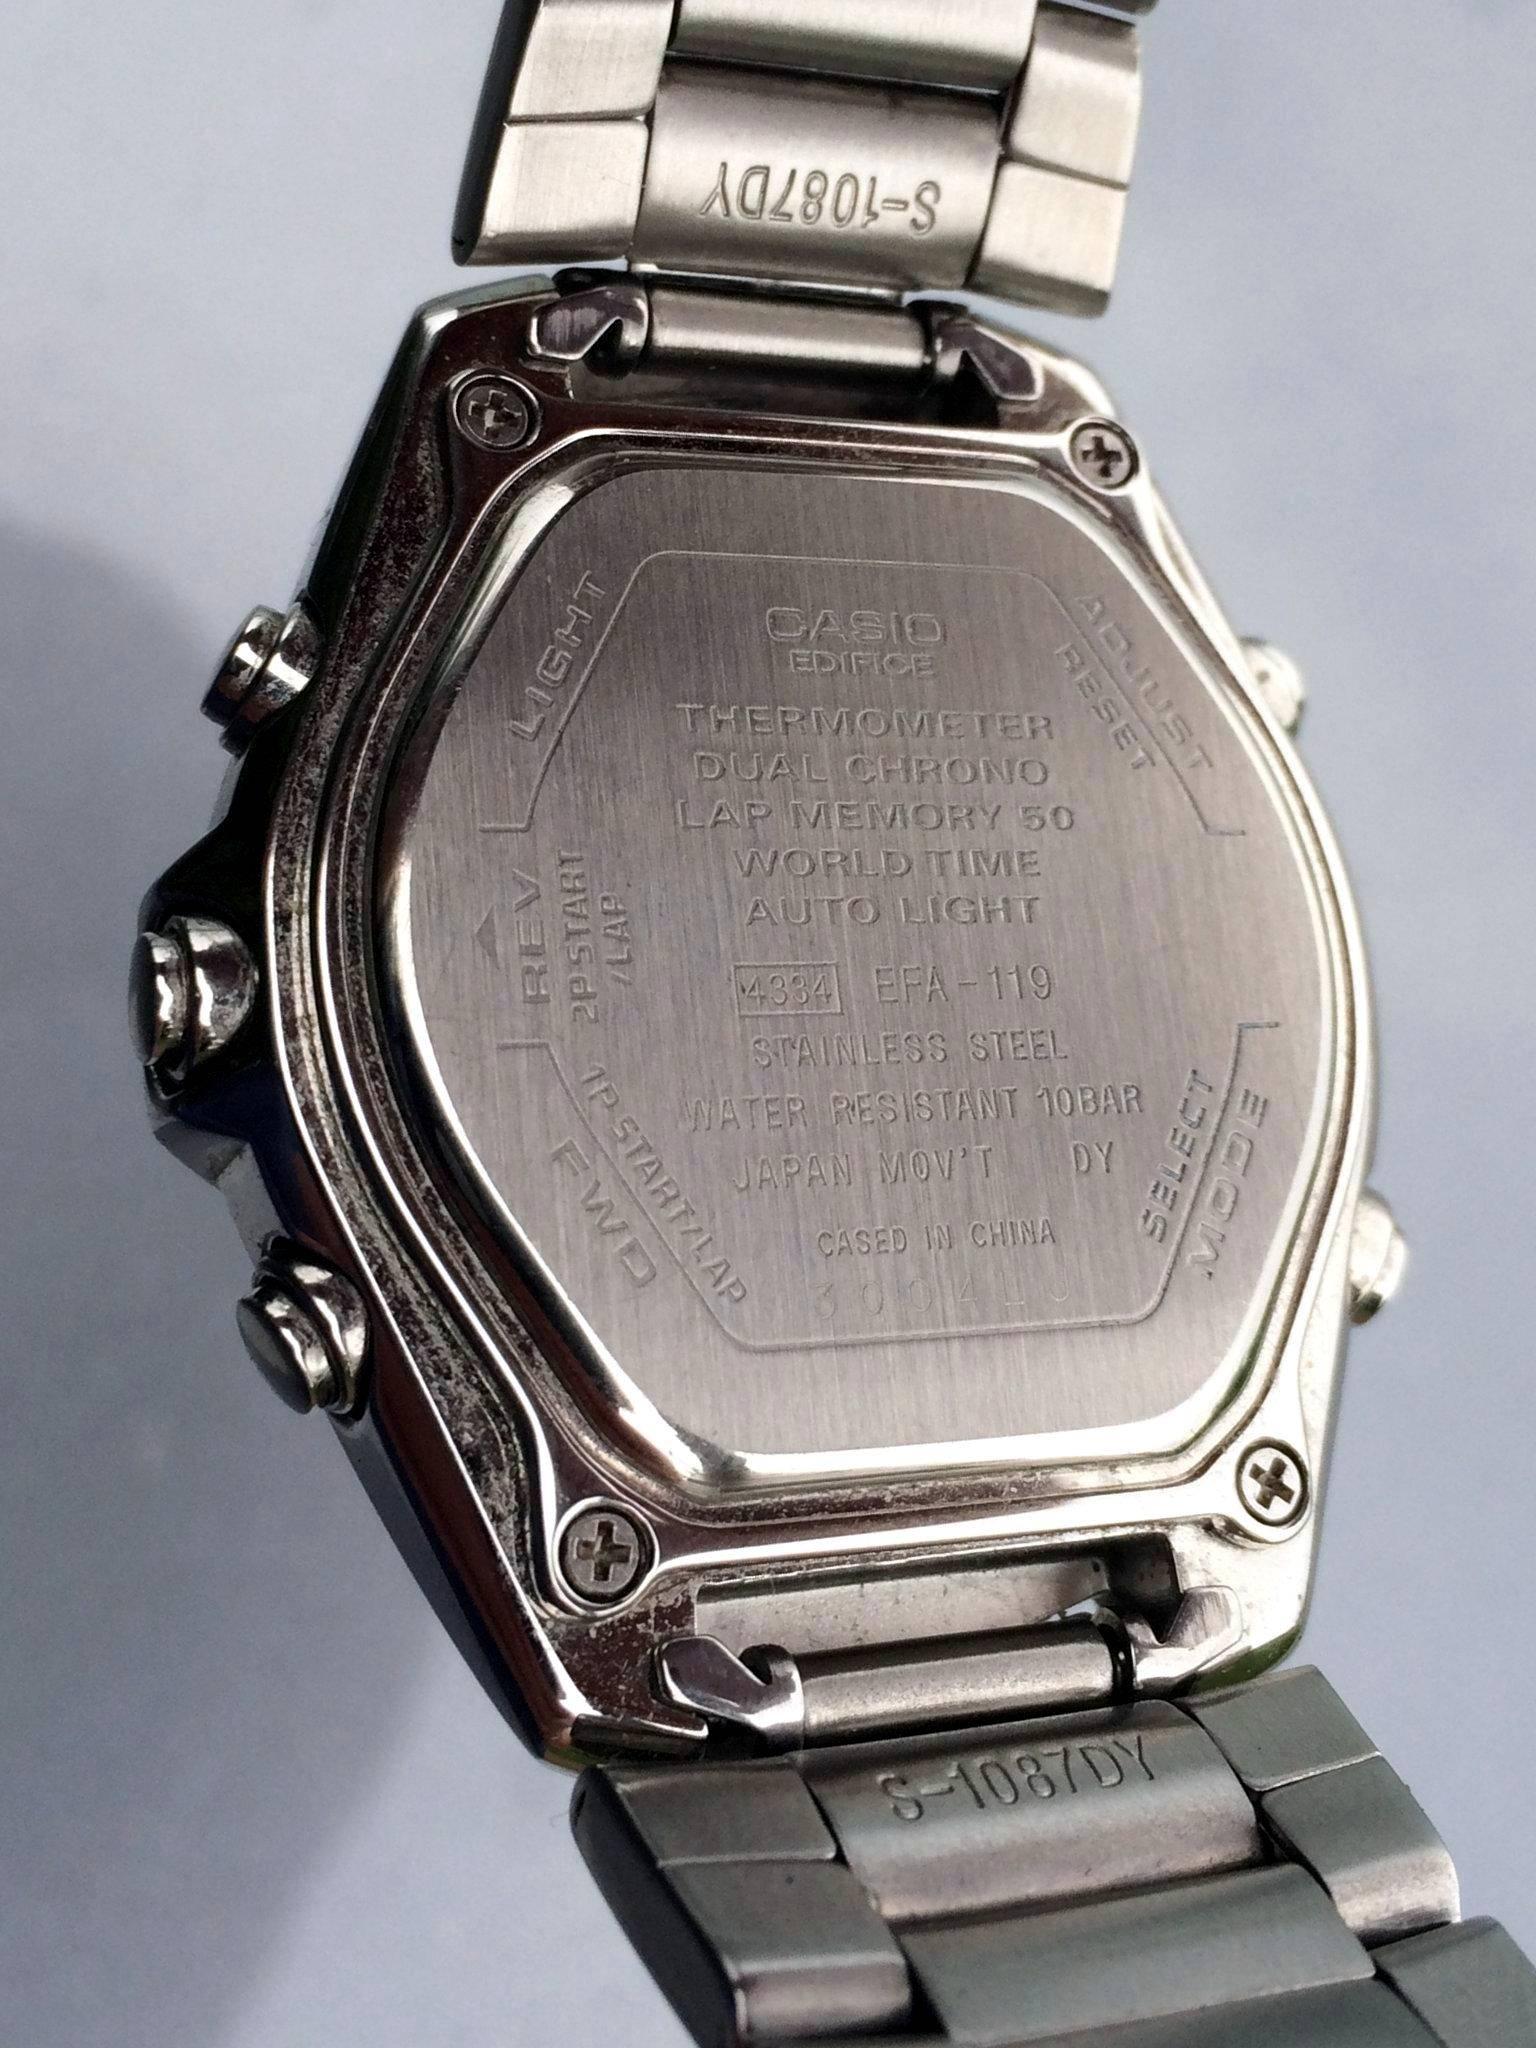 8b5e32f986c5 Cavalcade of Chronographs Day 55  Casio Edifice Ana-Digi Alarm GMT ...